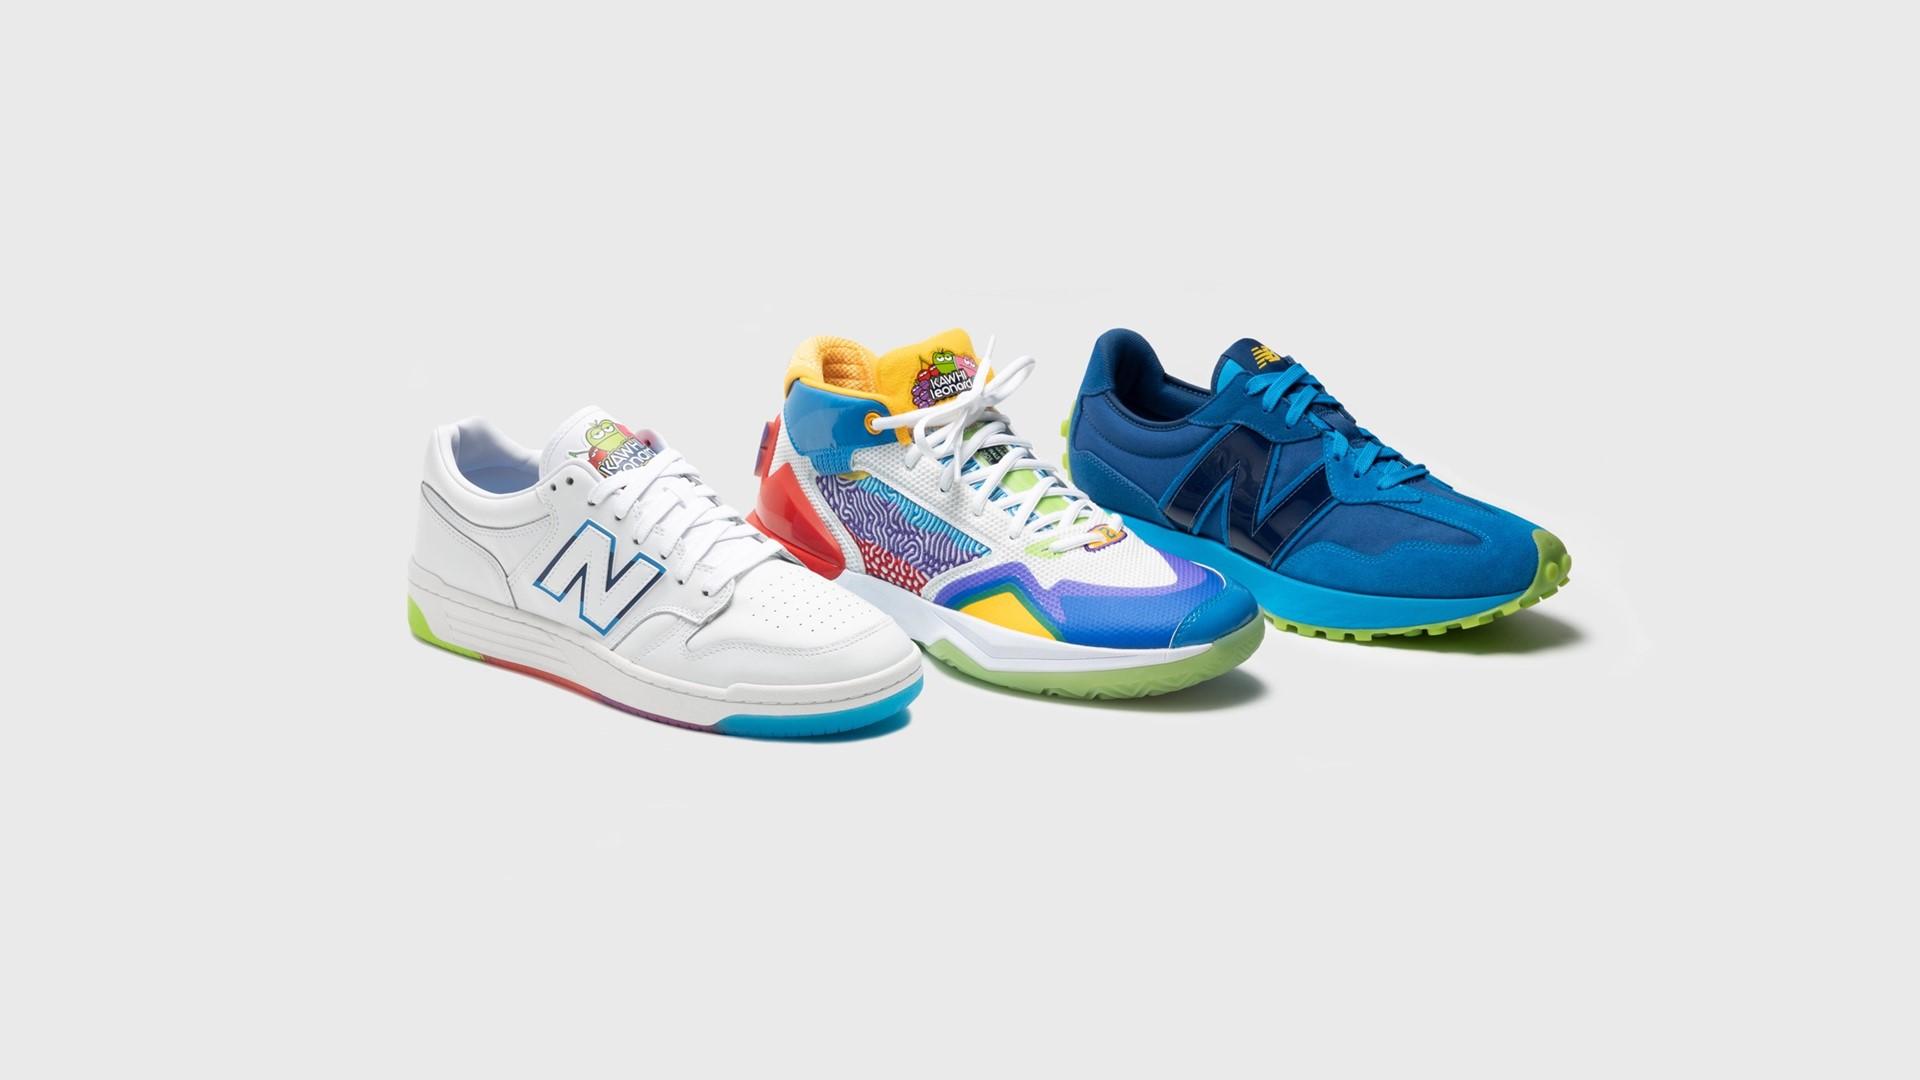 New Balance KAWHI Jolly Rancher Collaboration - Full Footwear Collection